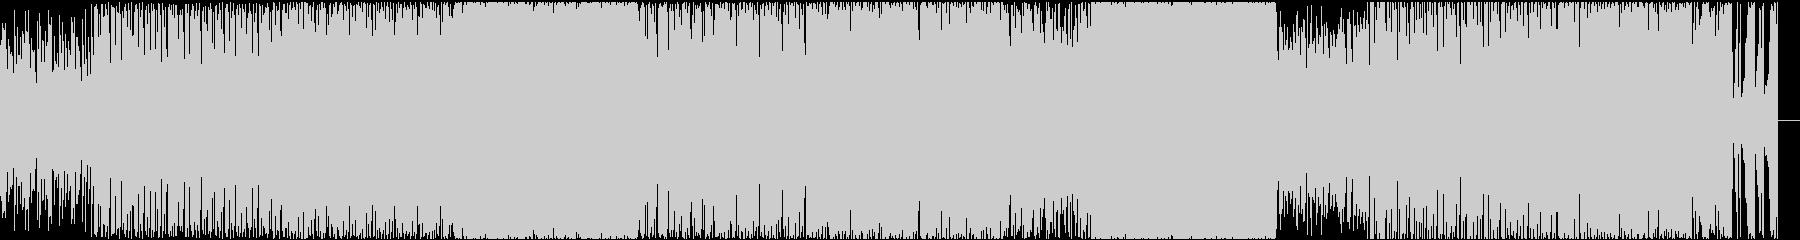 Hiphop/Piano/和風の未再生の波形